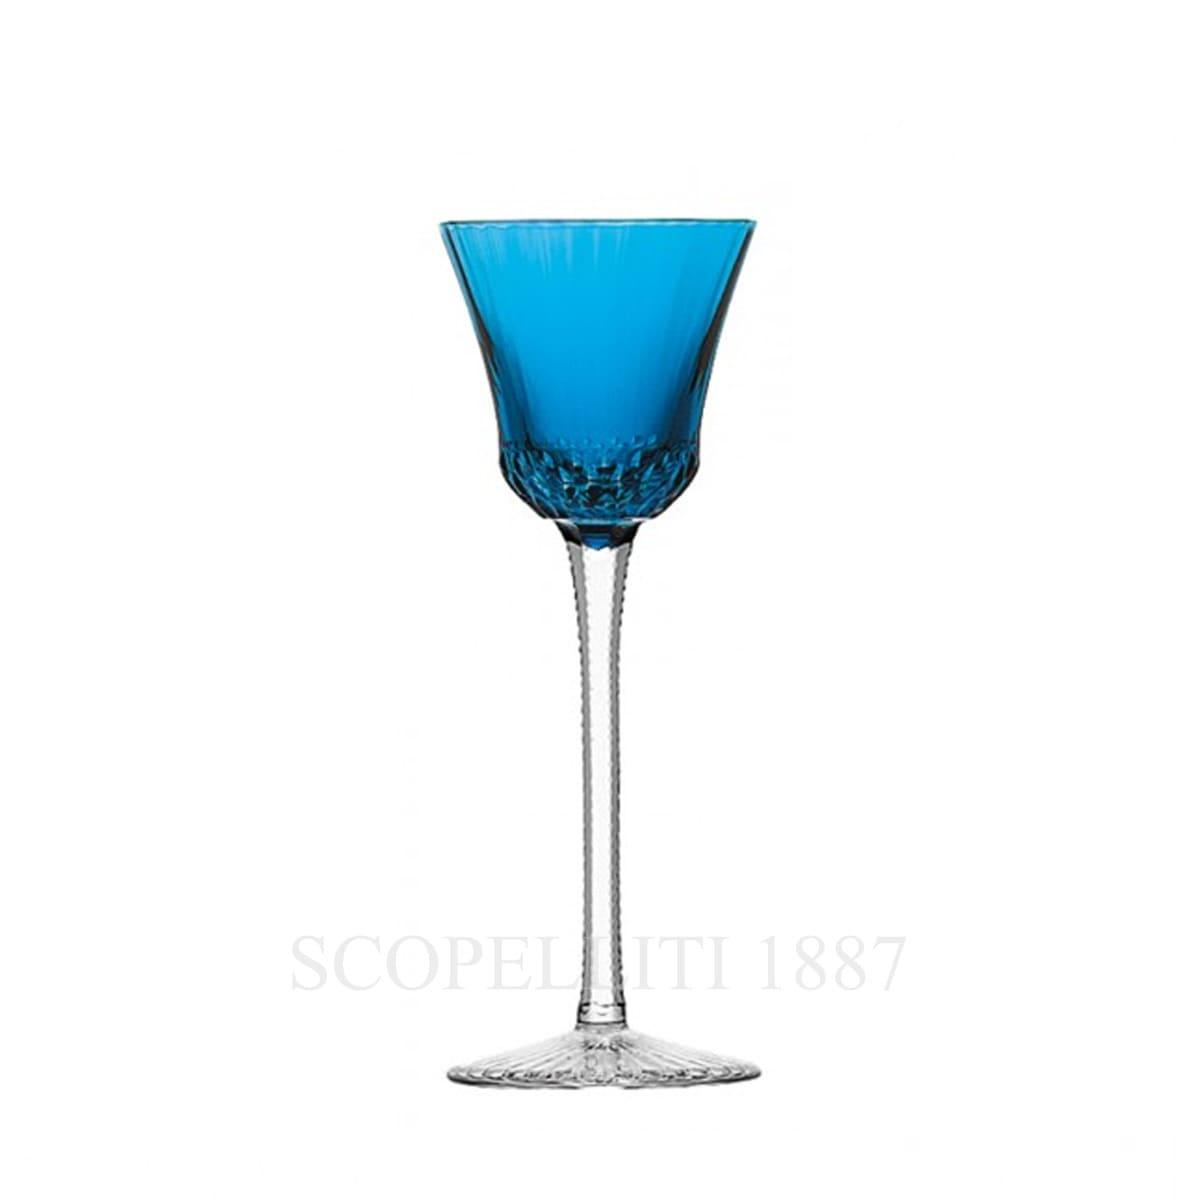 Saint Louis Apollo Crystal Roemer Light Blue